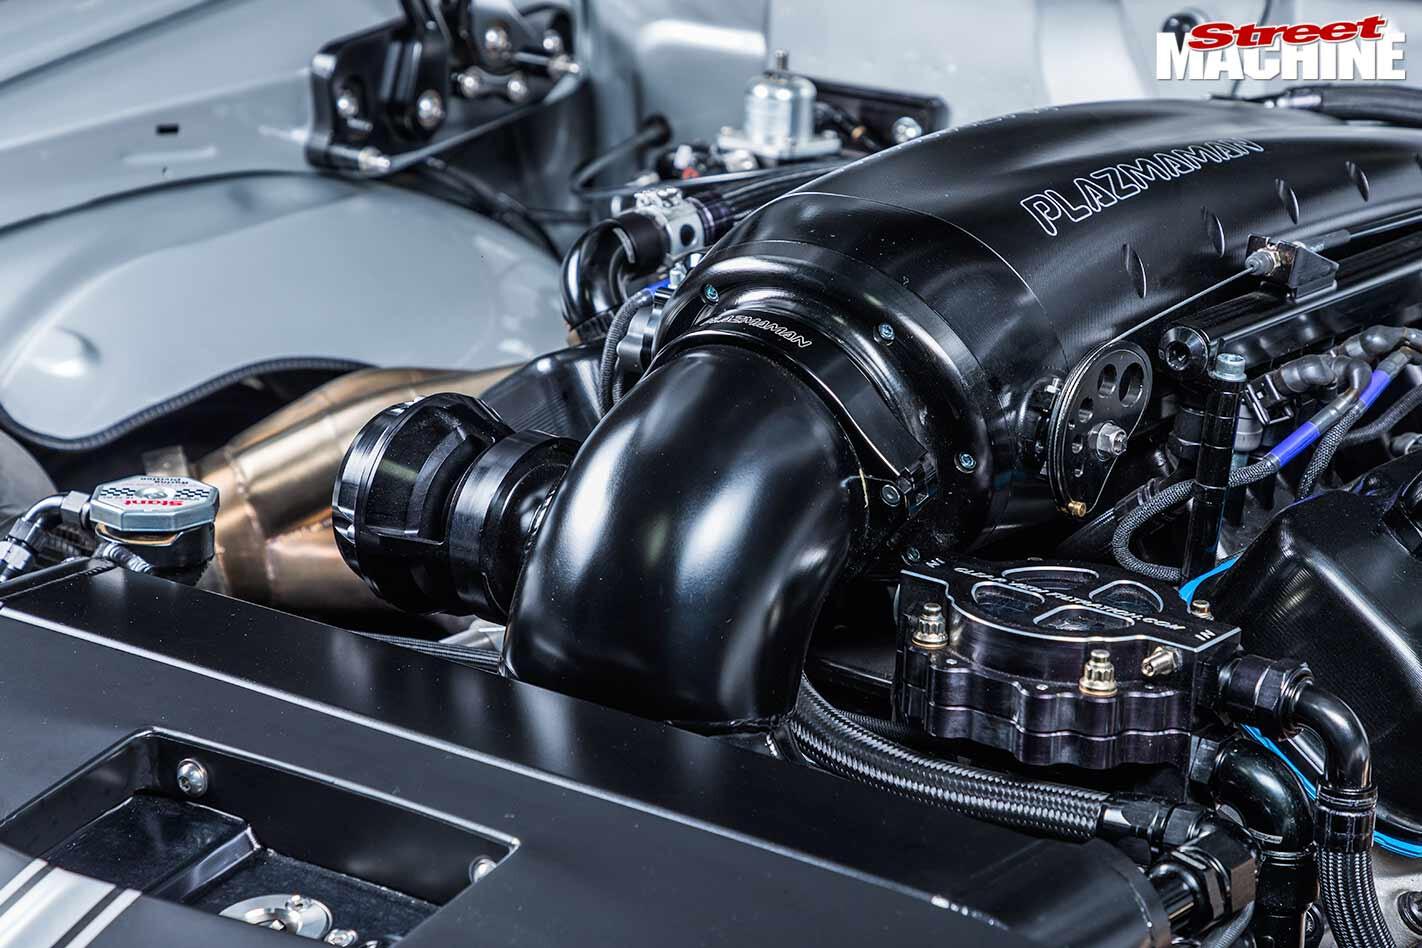 Holden HQ Monaro GTS engine bay